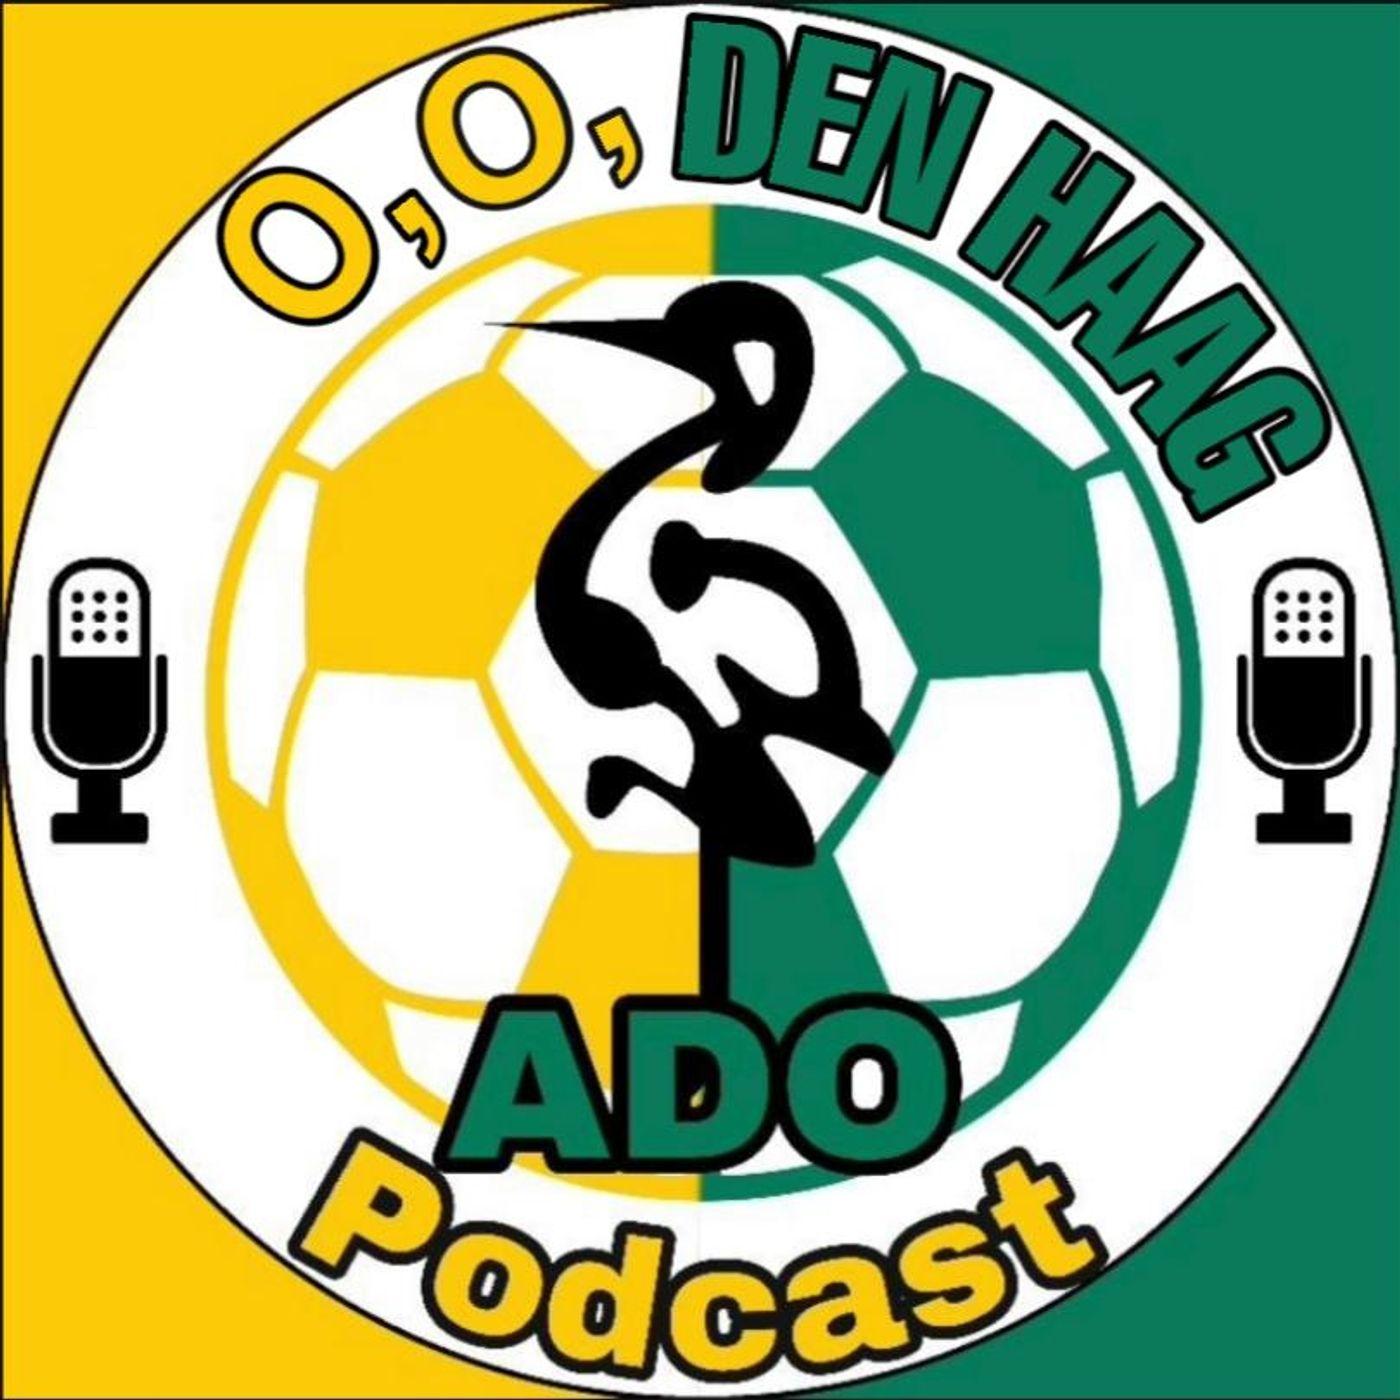 O, O, Den Haag, de ADO Podcast logo